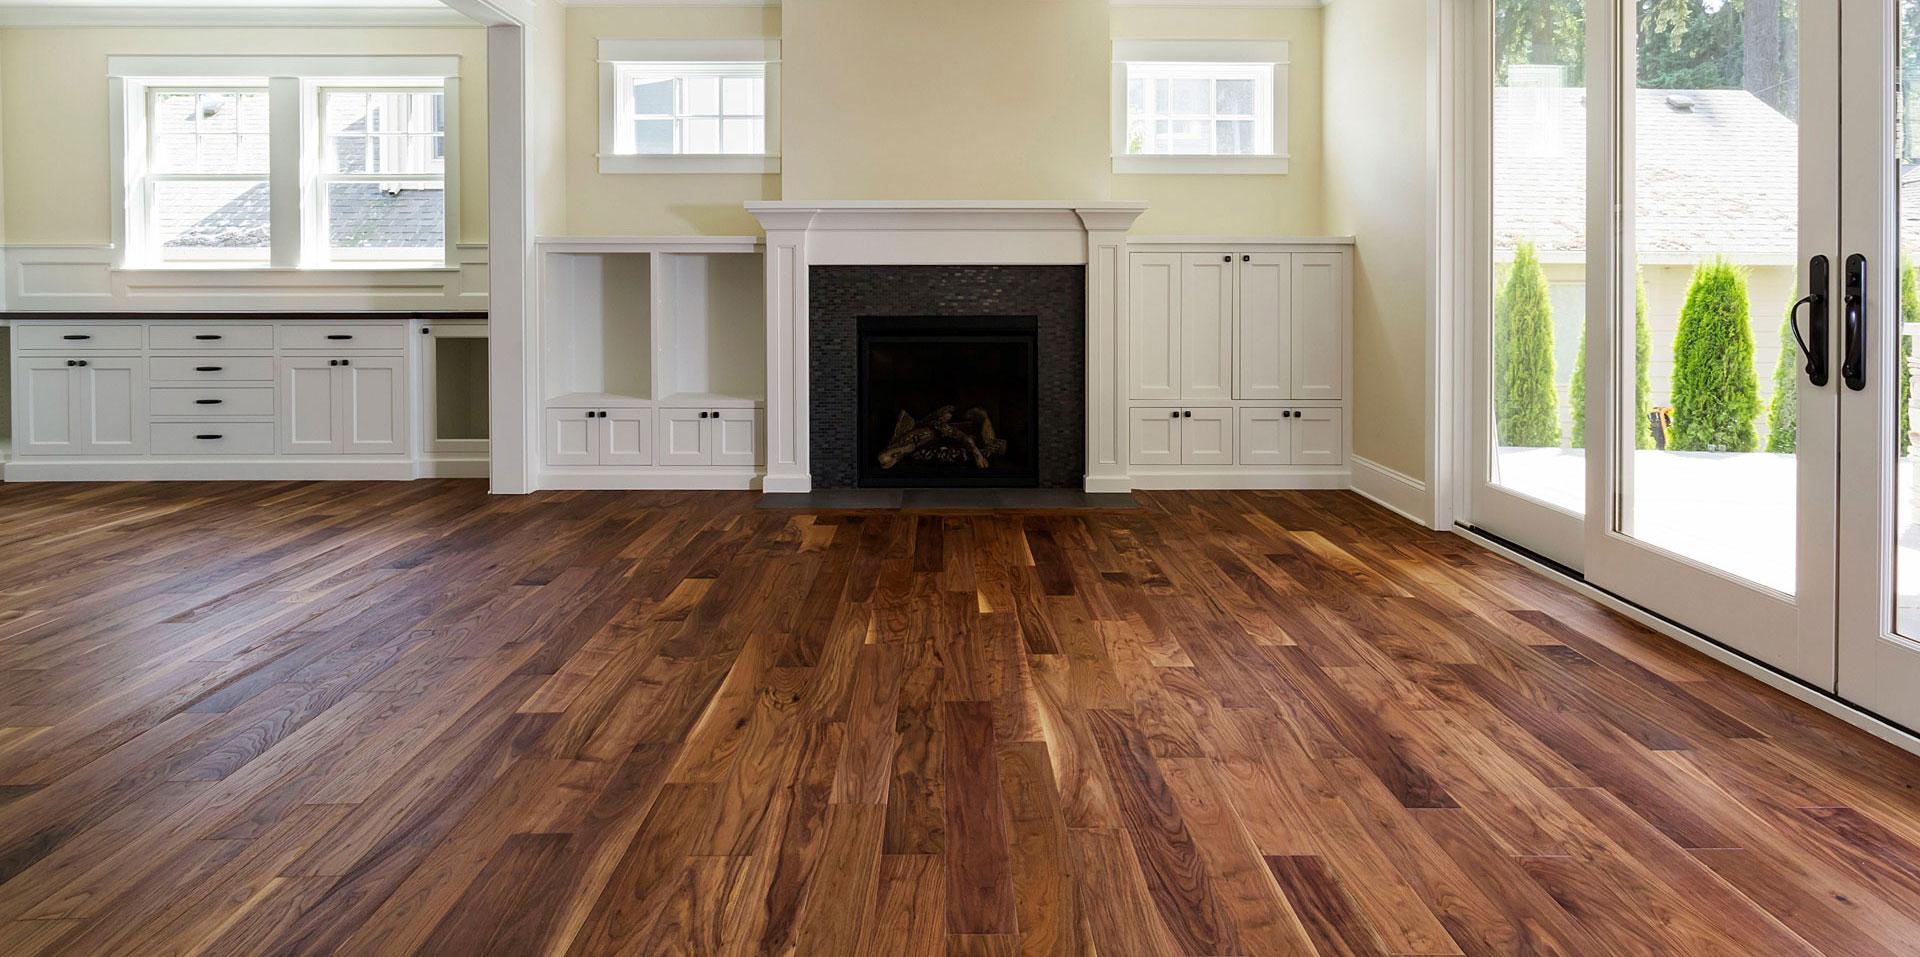 Flooring Installation Supplies Floor Hardwood Carpet Tile